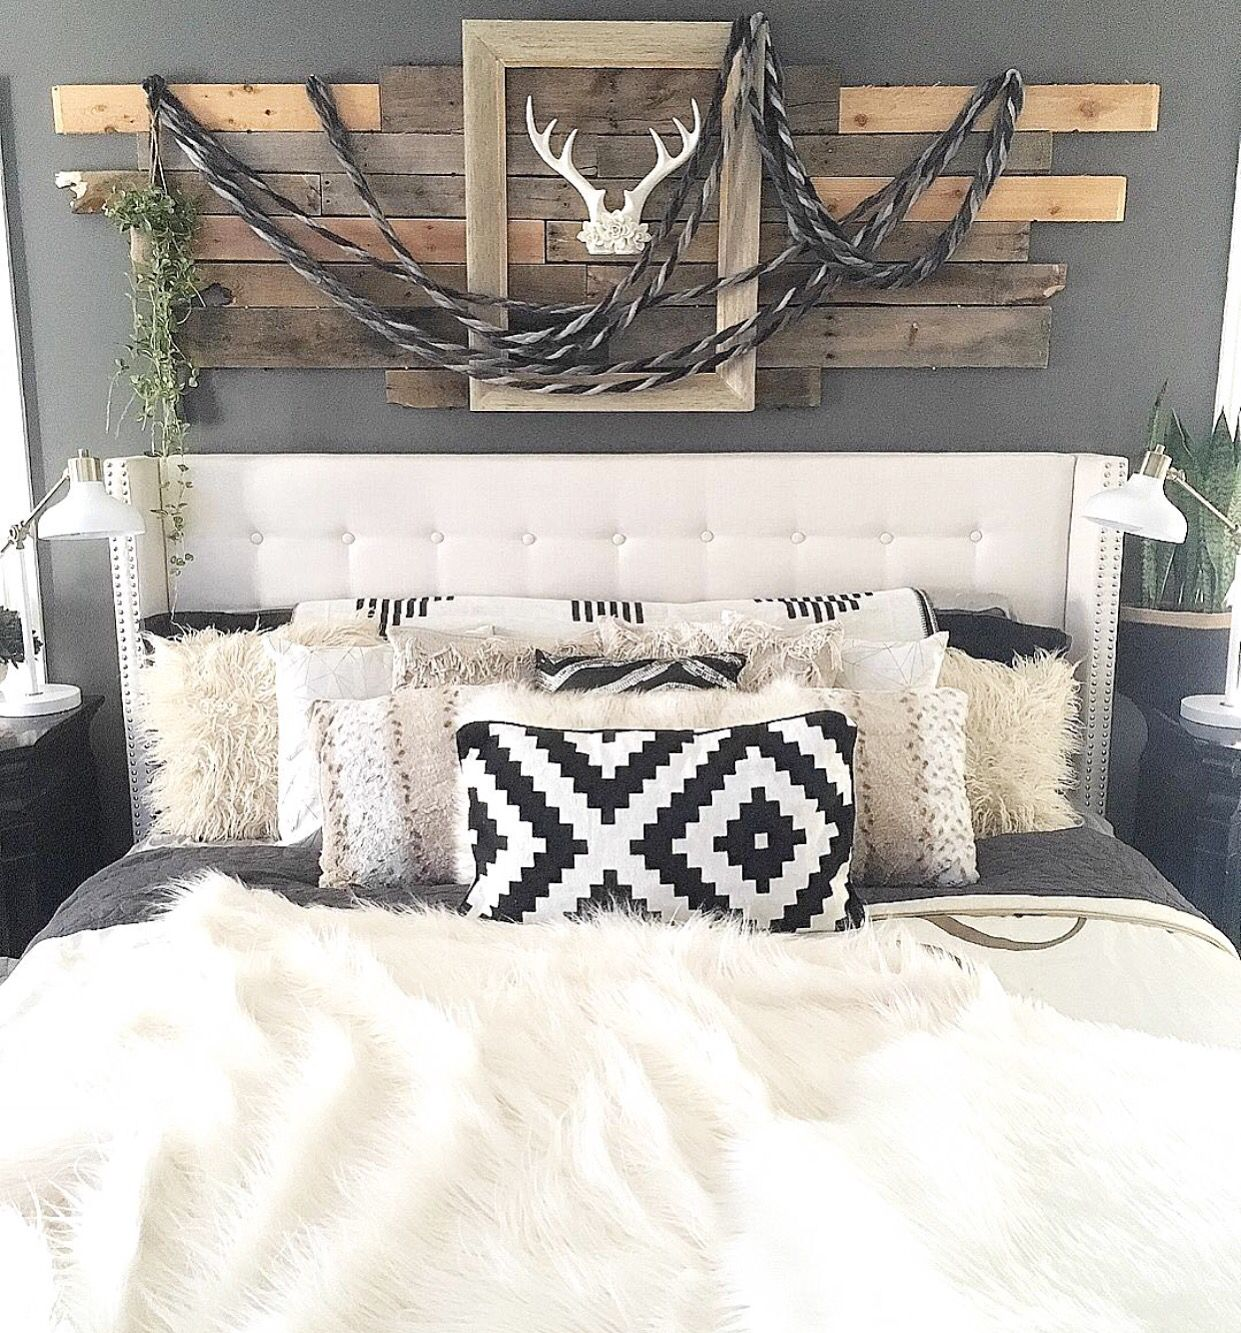 Rustic Boho Chic Master Bedroom Chic Master Bedroom Country Bedroom Decor Boho Chic Master Bedroom #rustic #boho #living #room